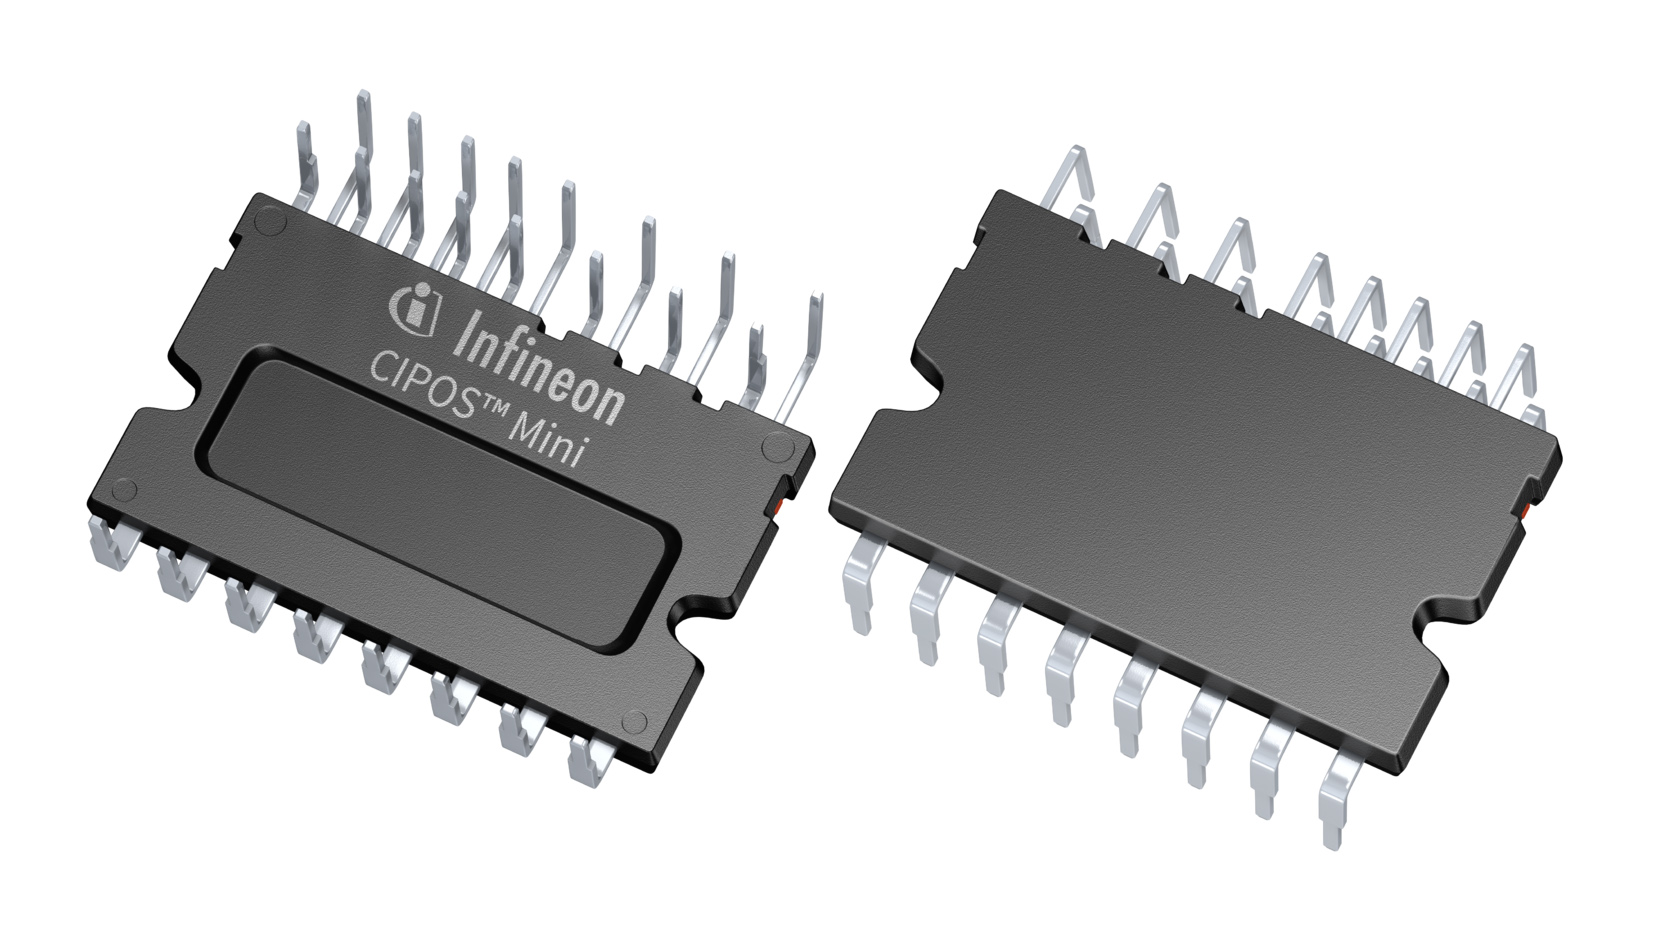 Infineons Cipos Mini Ipms Deliver Higher Efficiency In Low Power Voltage Motor Drivers Coolmos